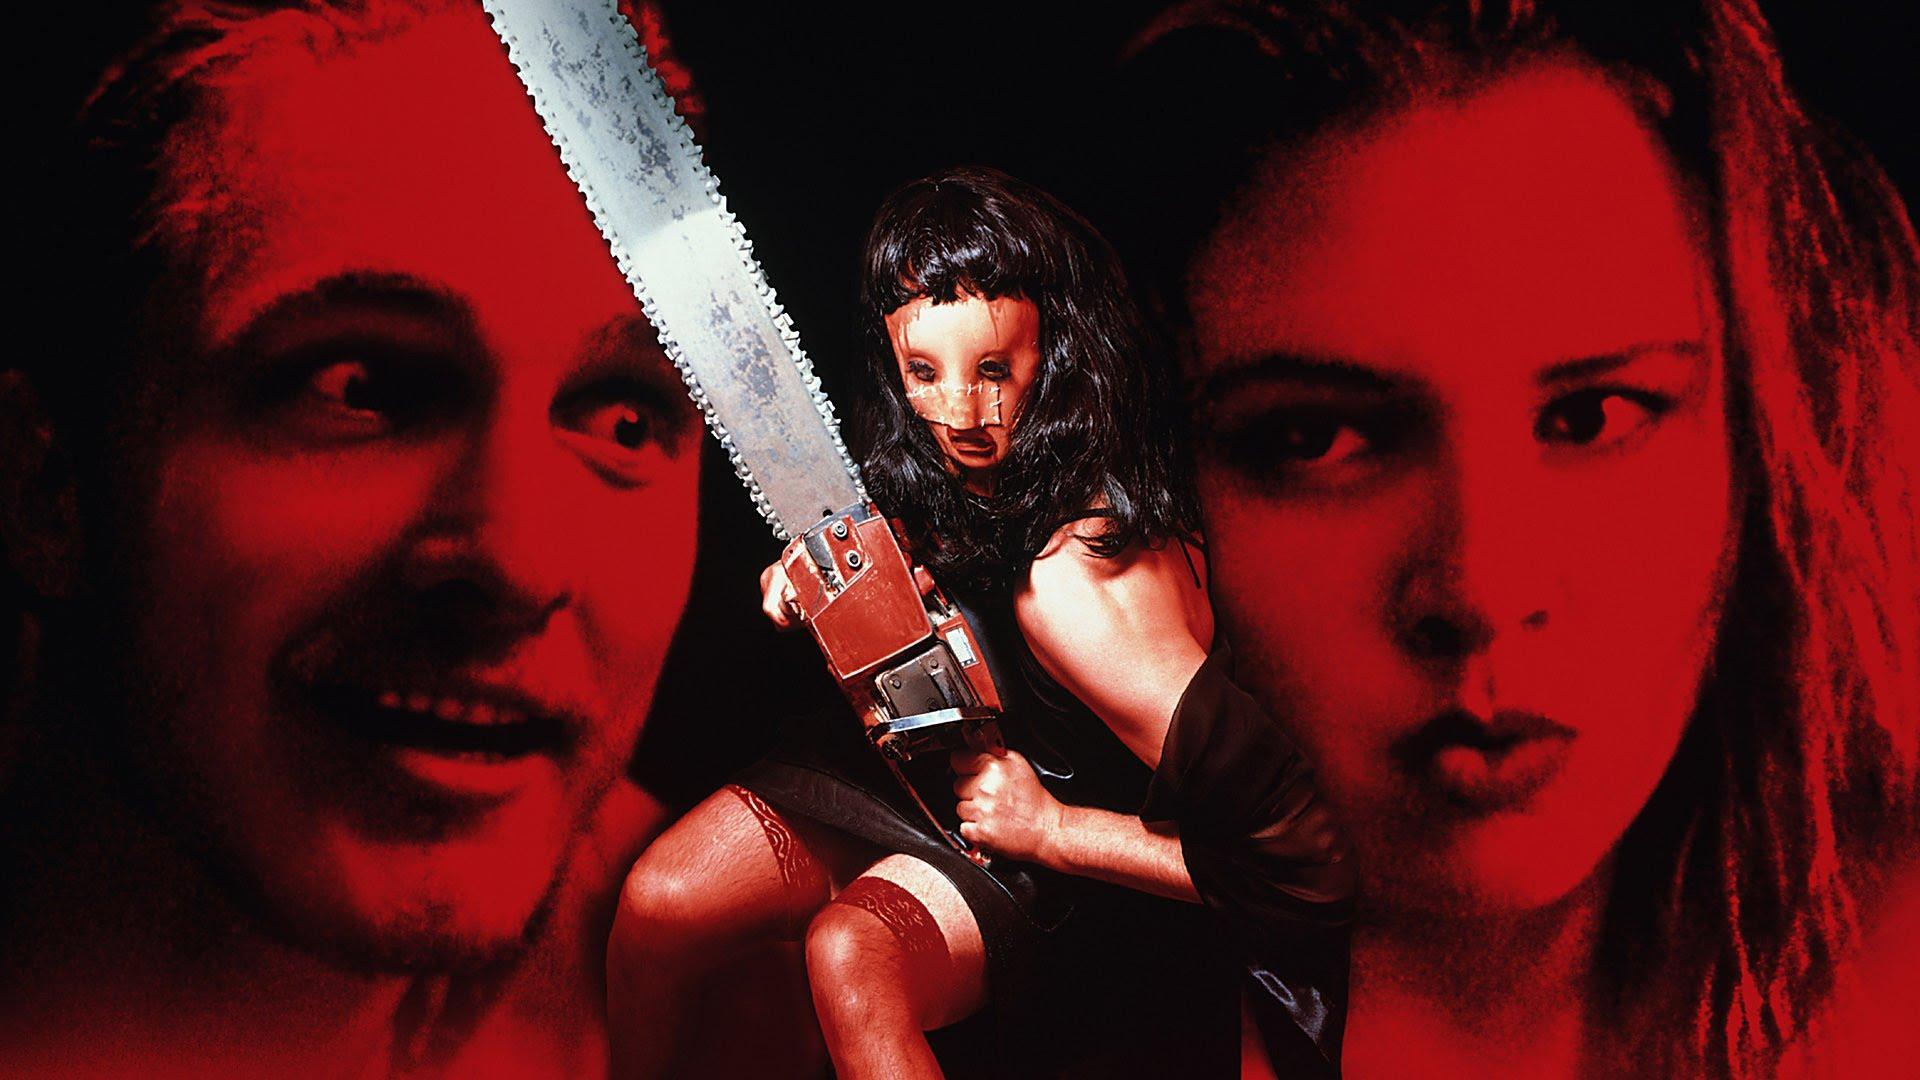 Texas Chainsaw Massace: The Next Generation (1994) 1. kép